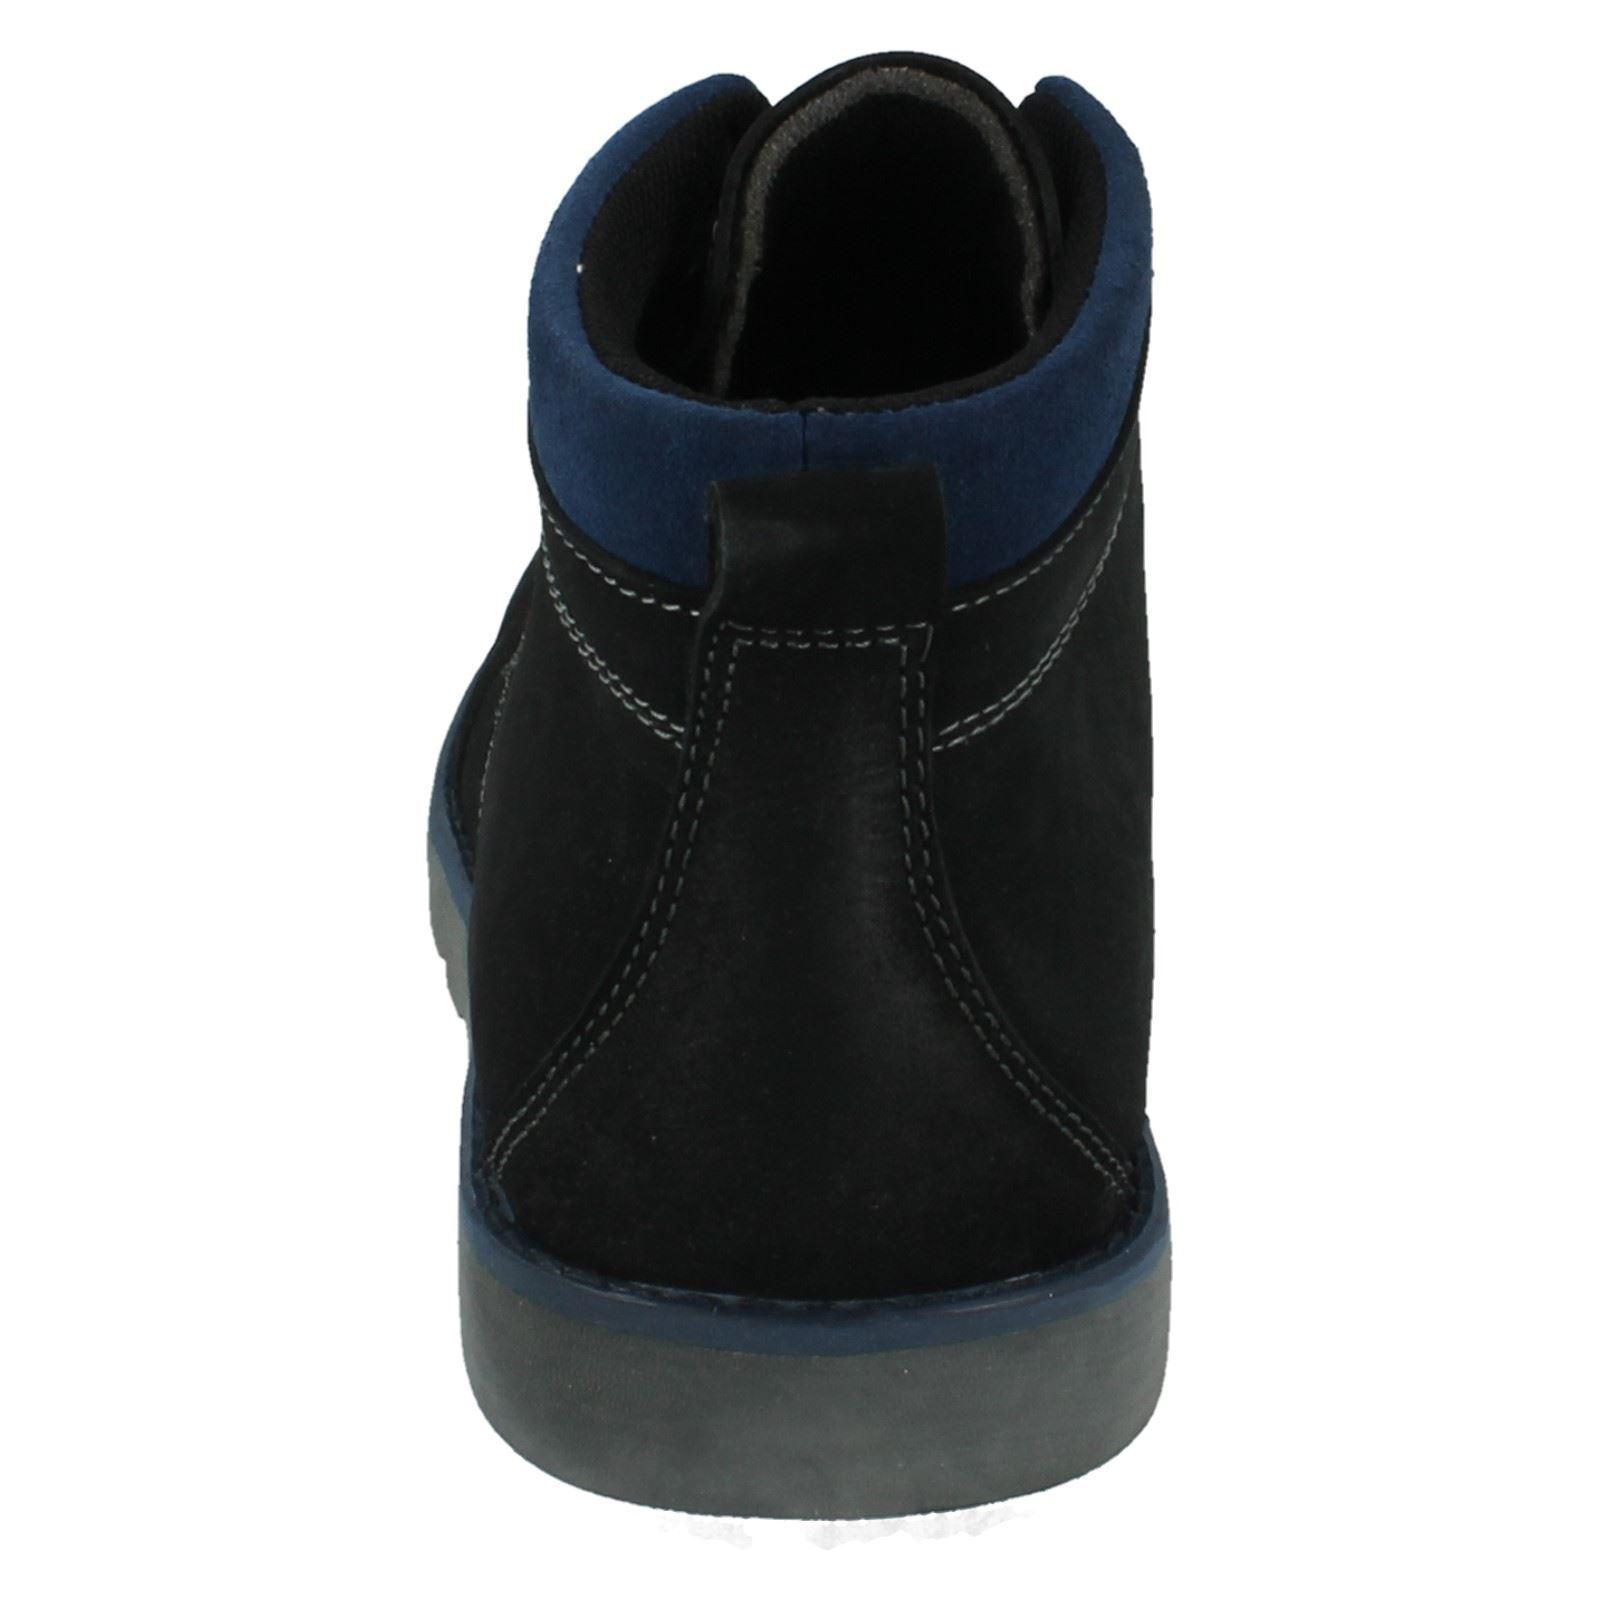 Billig hohe Qualität MENS BOOTS THOMAS BLUNT BOOTS MENS A3056 8b13f8